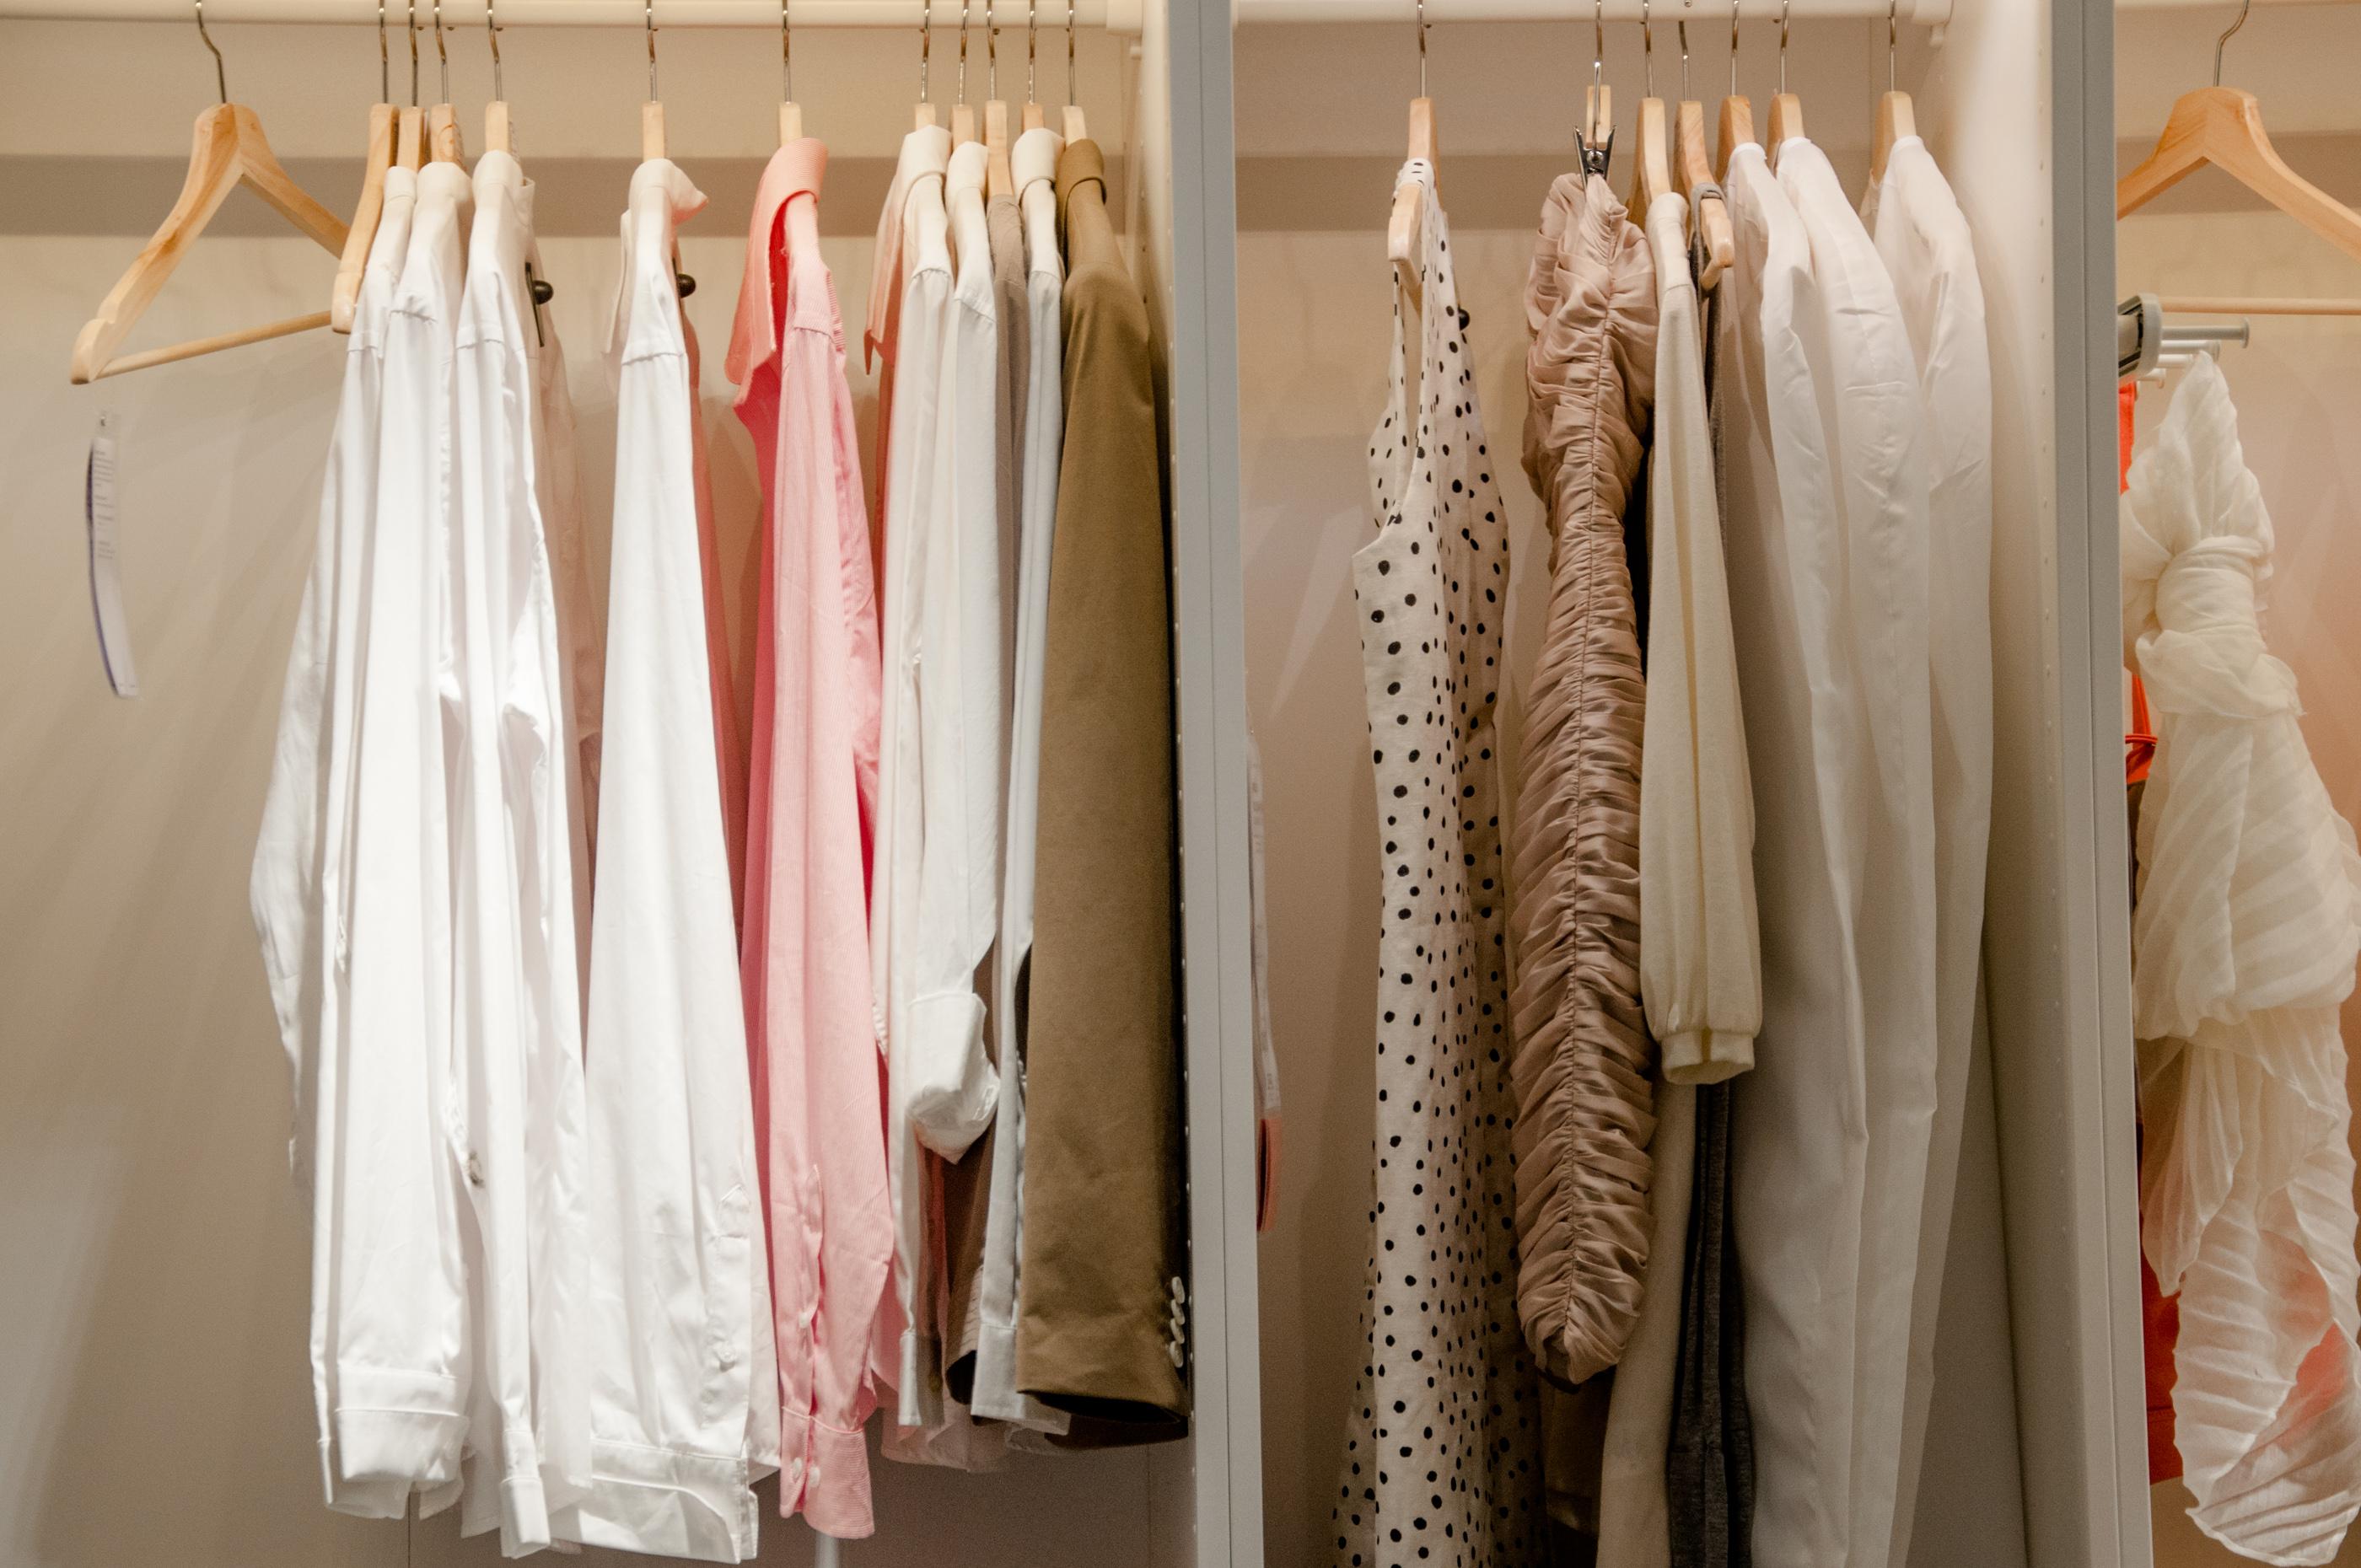 wardrobe, Shirts, Ordinary, Organization, Regular, HQ Photo